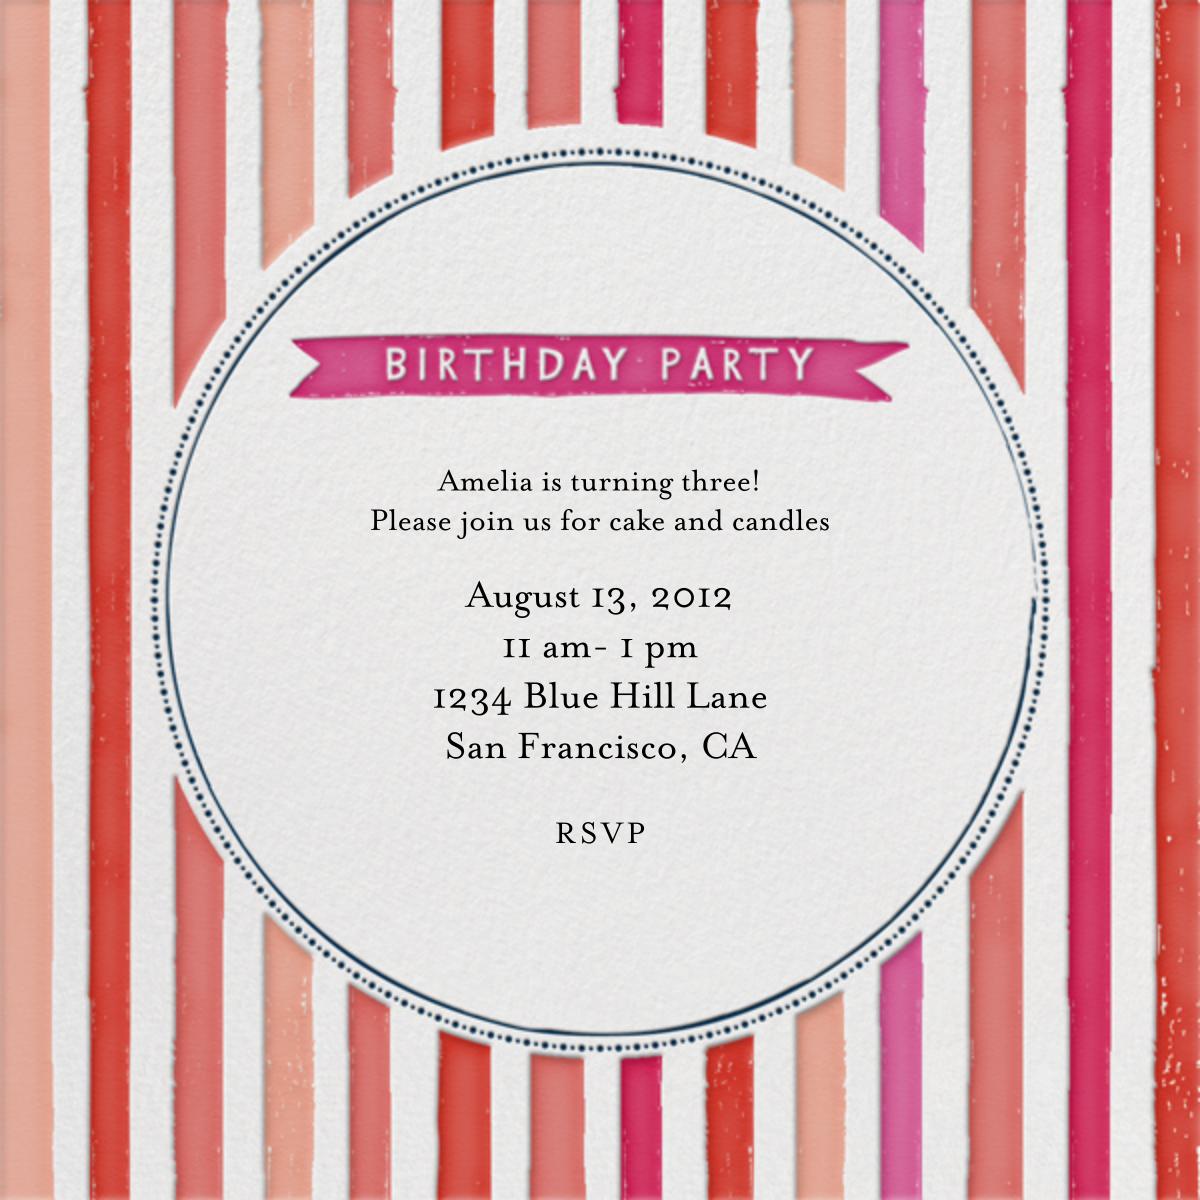 Chocolate or Vanilla Ice Cream - Pinks - Mr. Boddington's Studio - Kids' birthday